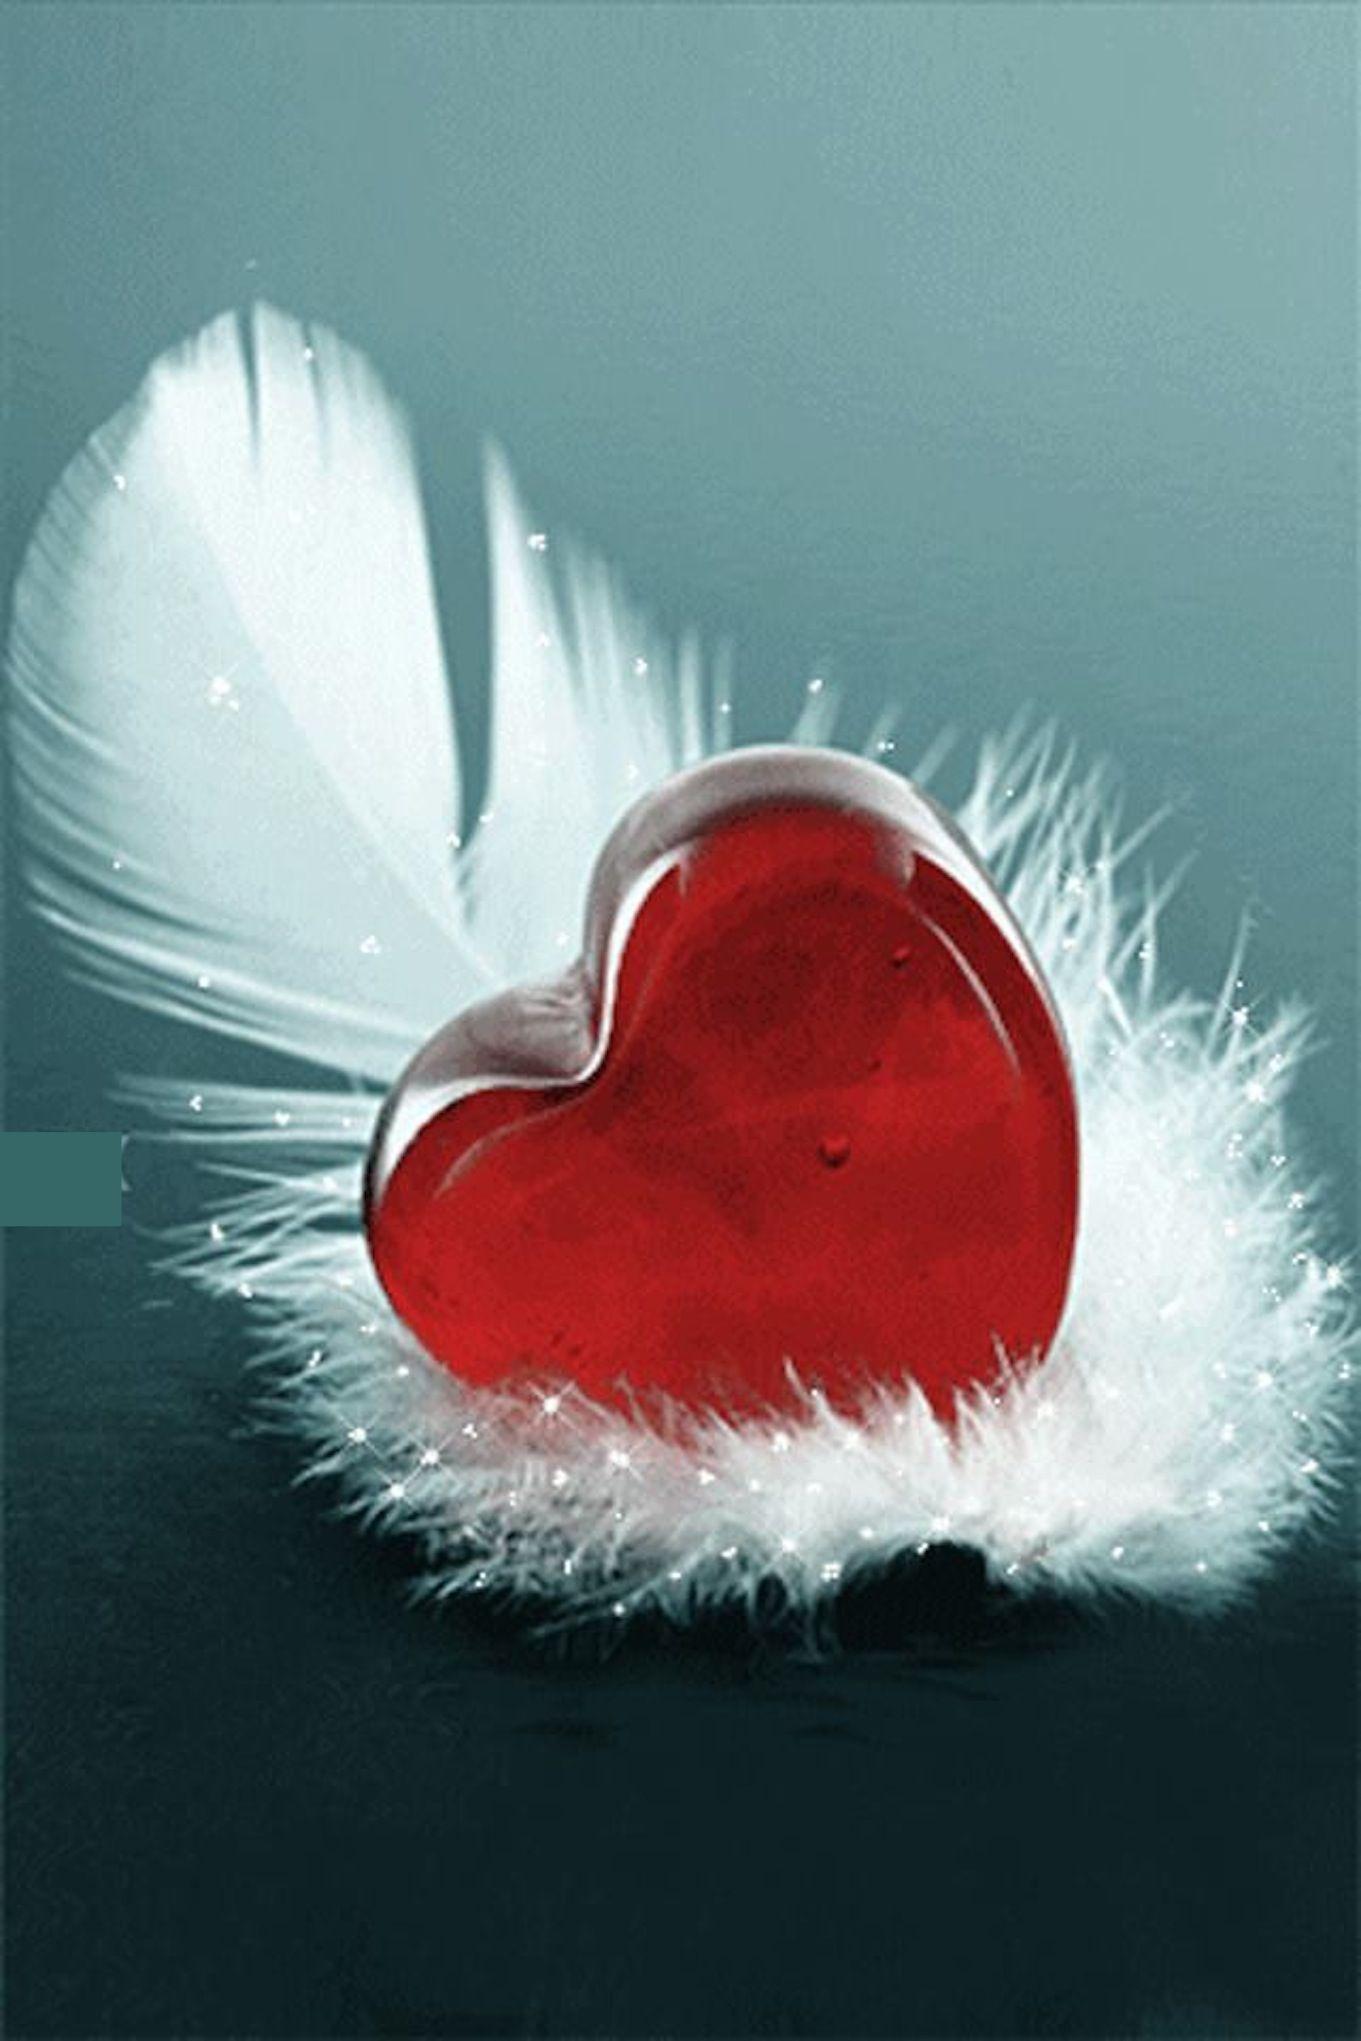 Mais Qui Est Le Poete Ilef Smaoui Plume De Poete Coeur Gif Image Coeur Coeur En Photo